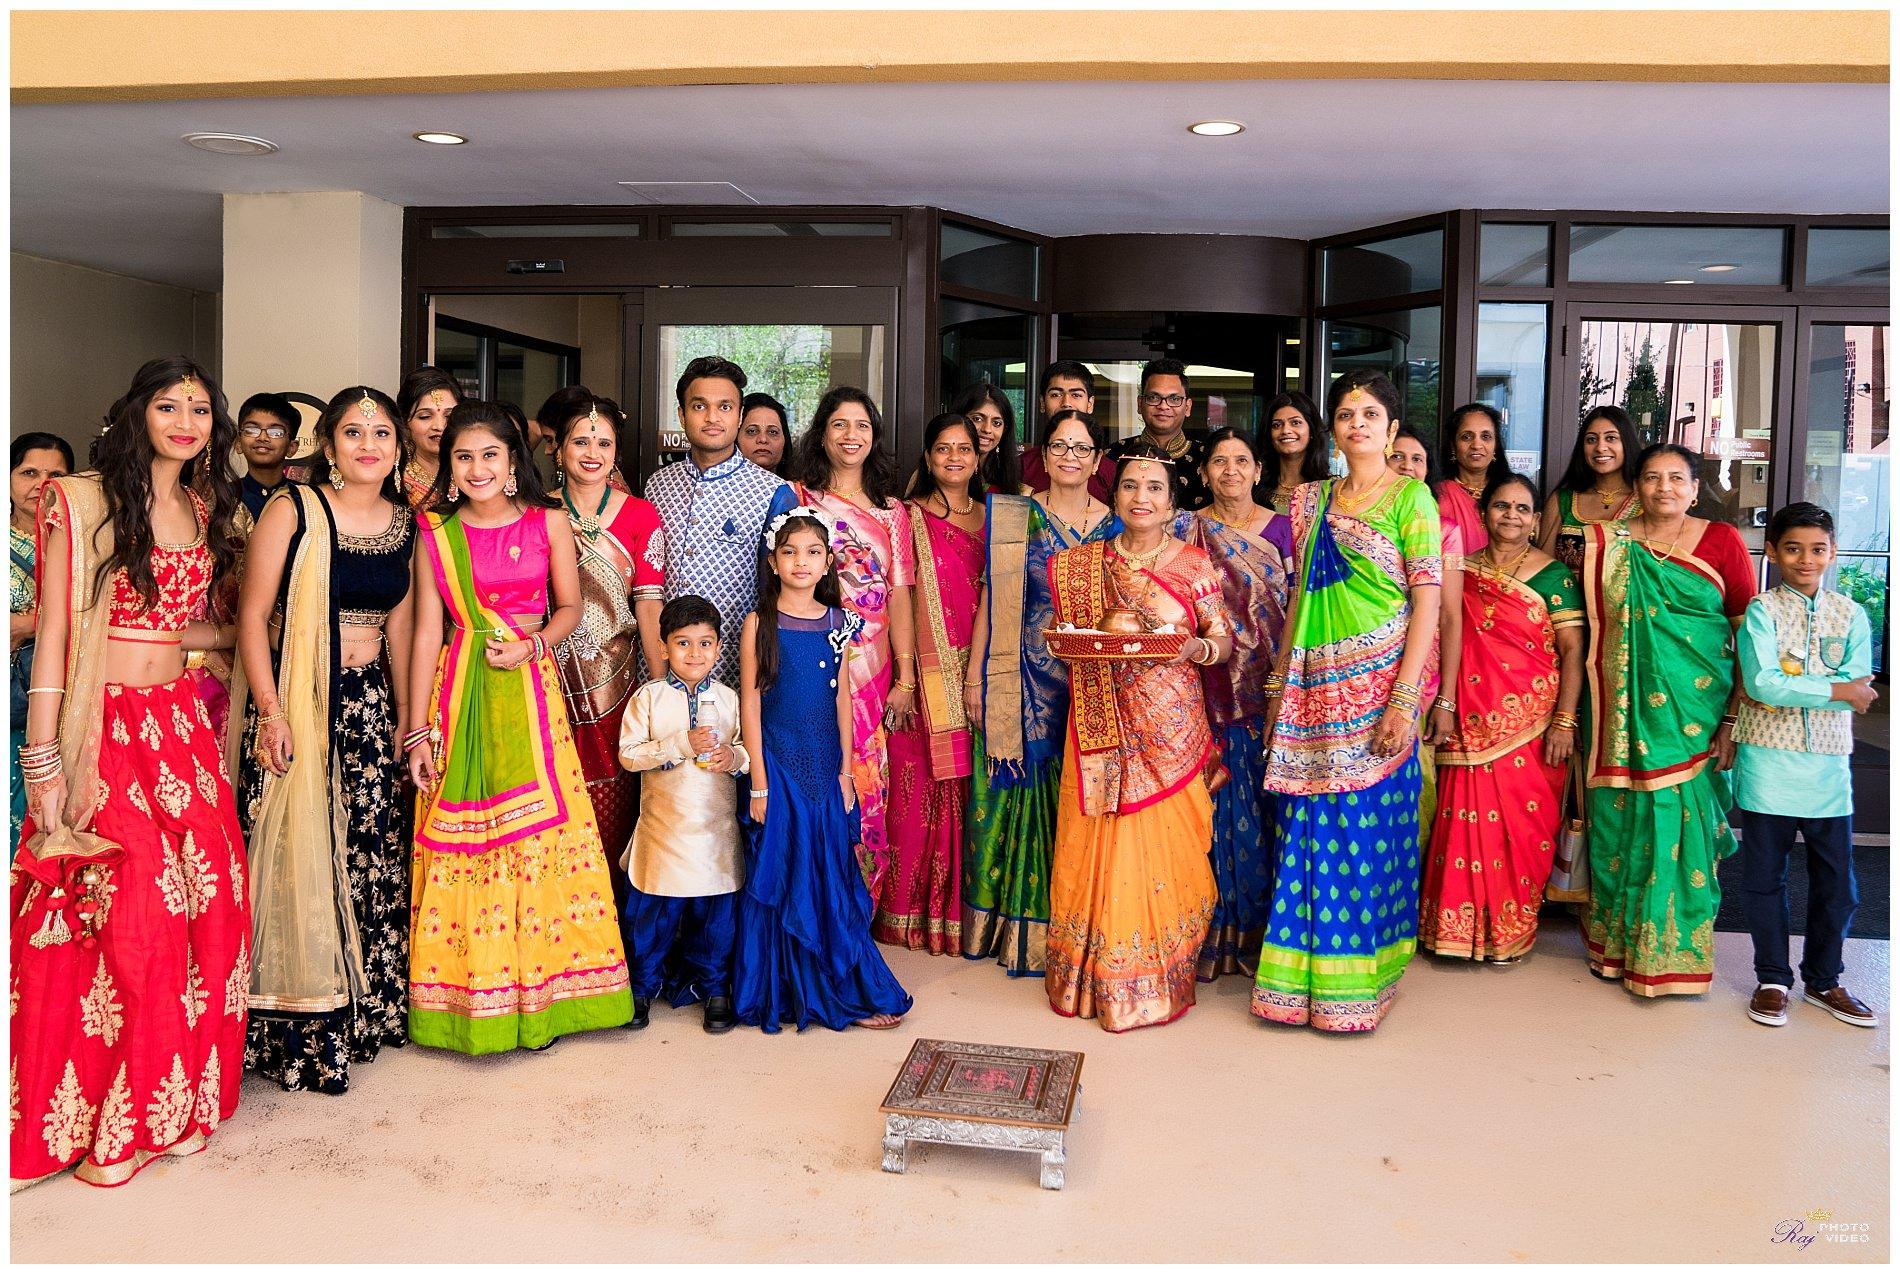 doubletree-by-hilton-hotel-wilmington-de-wedding-krishna-ritesh-48.jpg